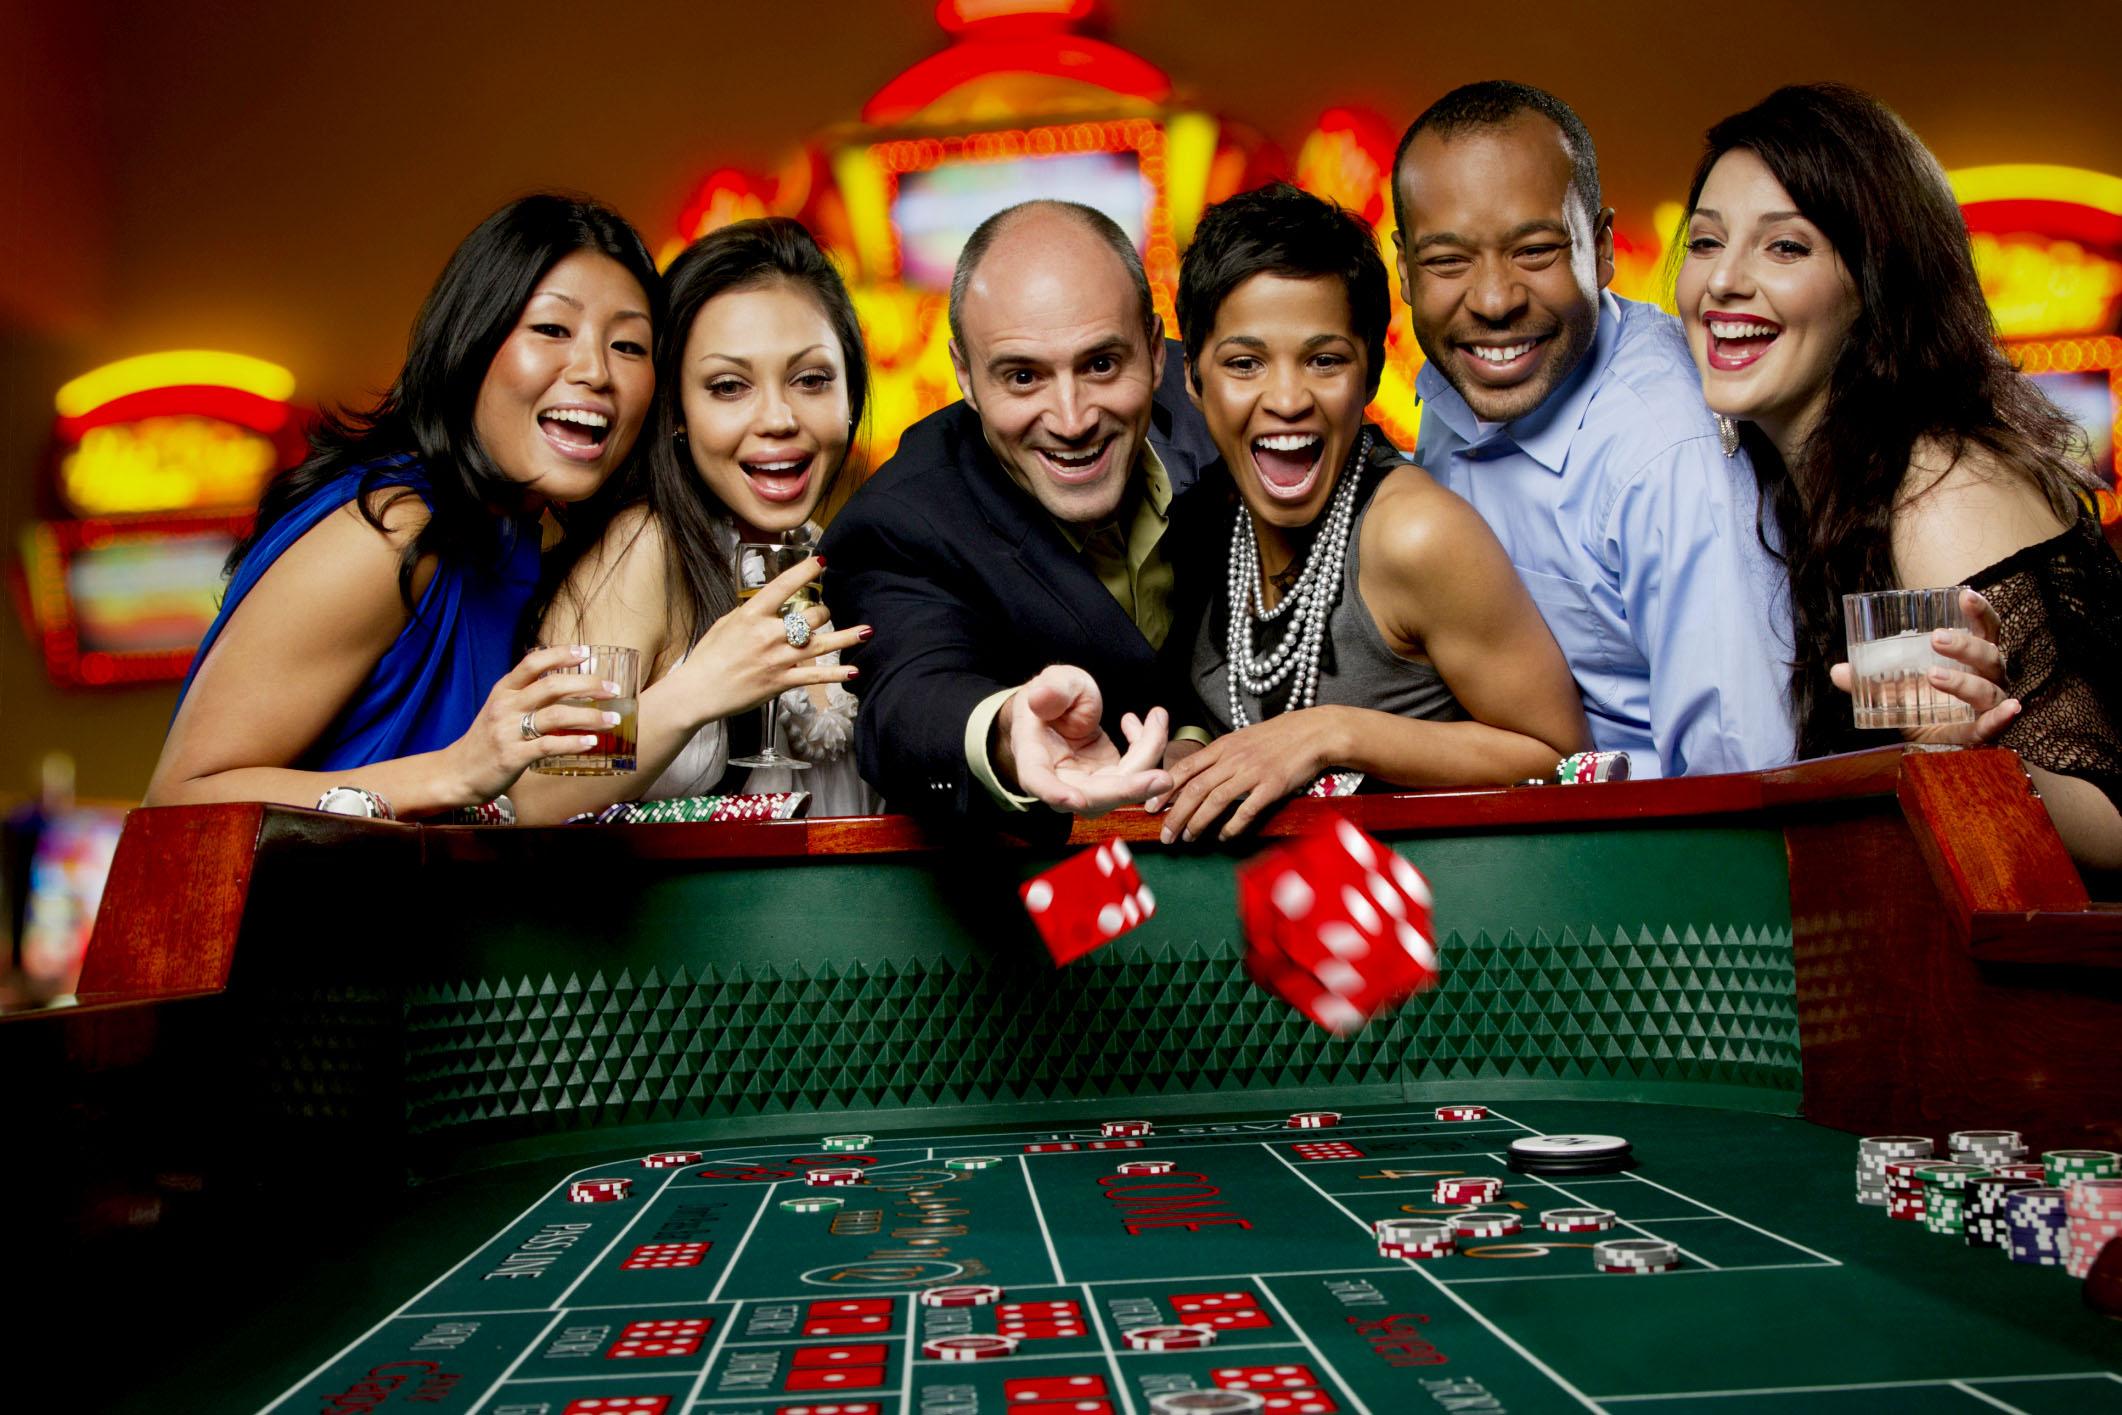 Build 5,000 Powerful SEO PBN Backlinks Judi Bola Casino Gambling Poker Website 1St Page Google Rank